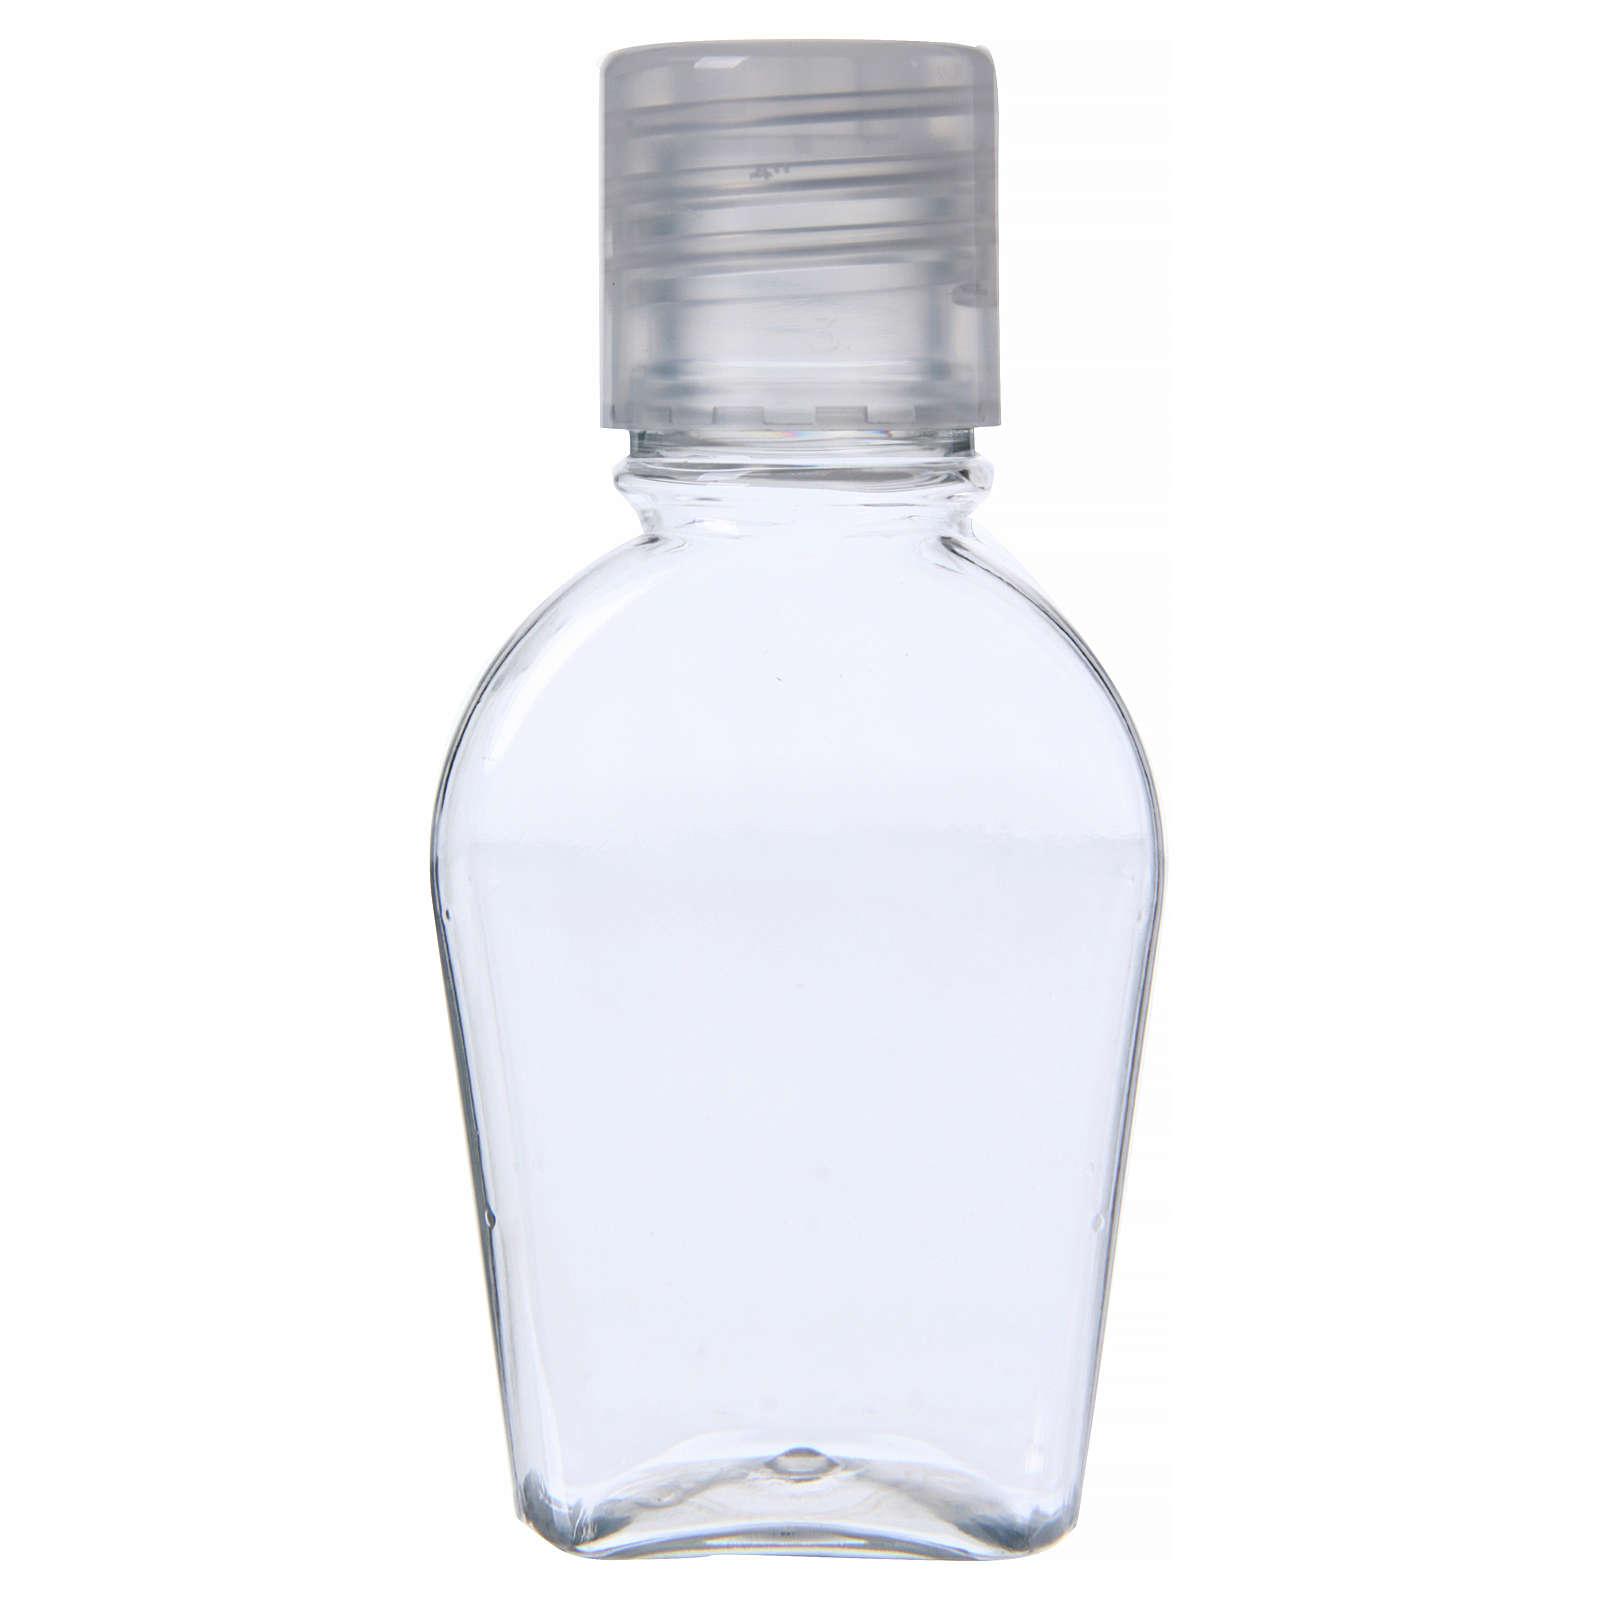 Bottles for holy water 30 ml 100 pcs set 3